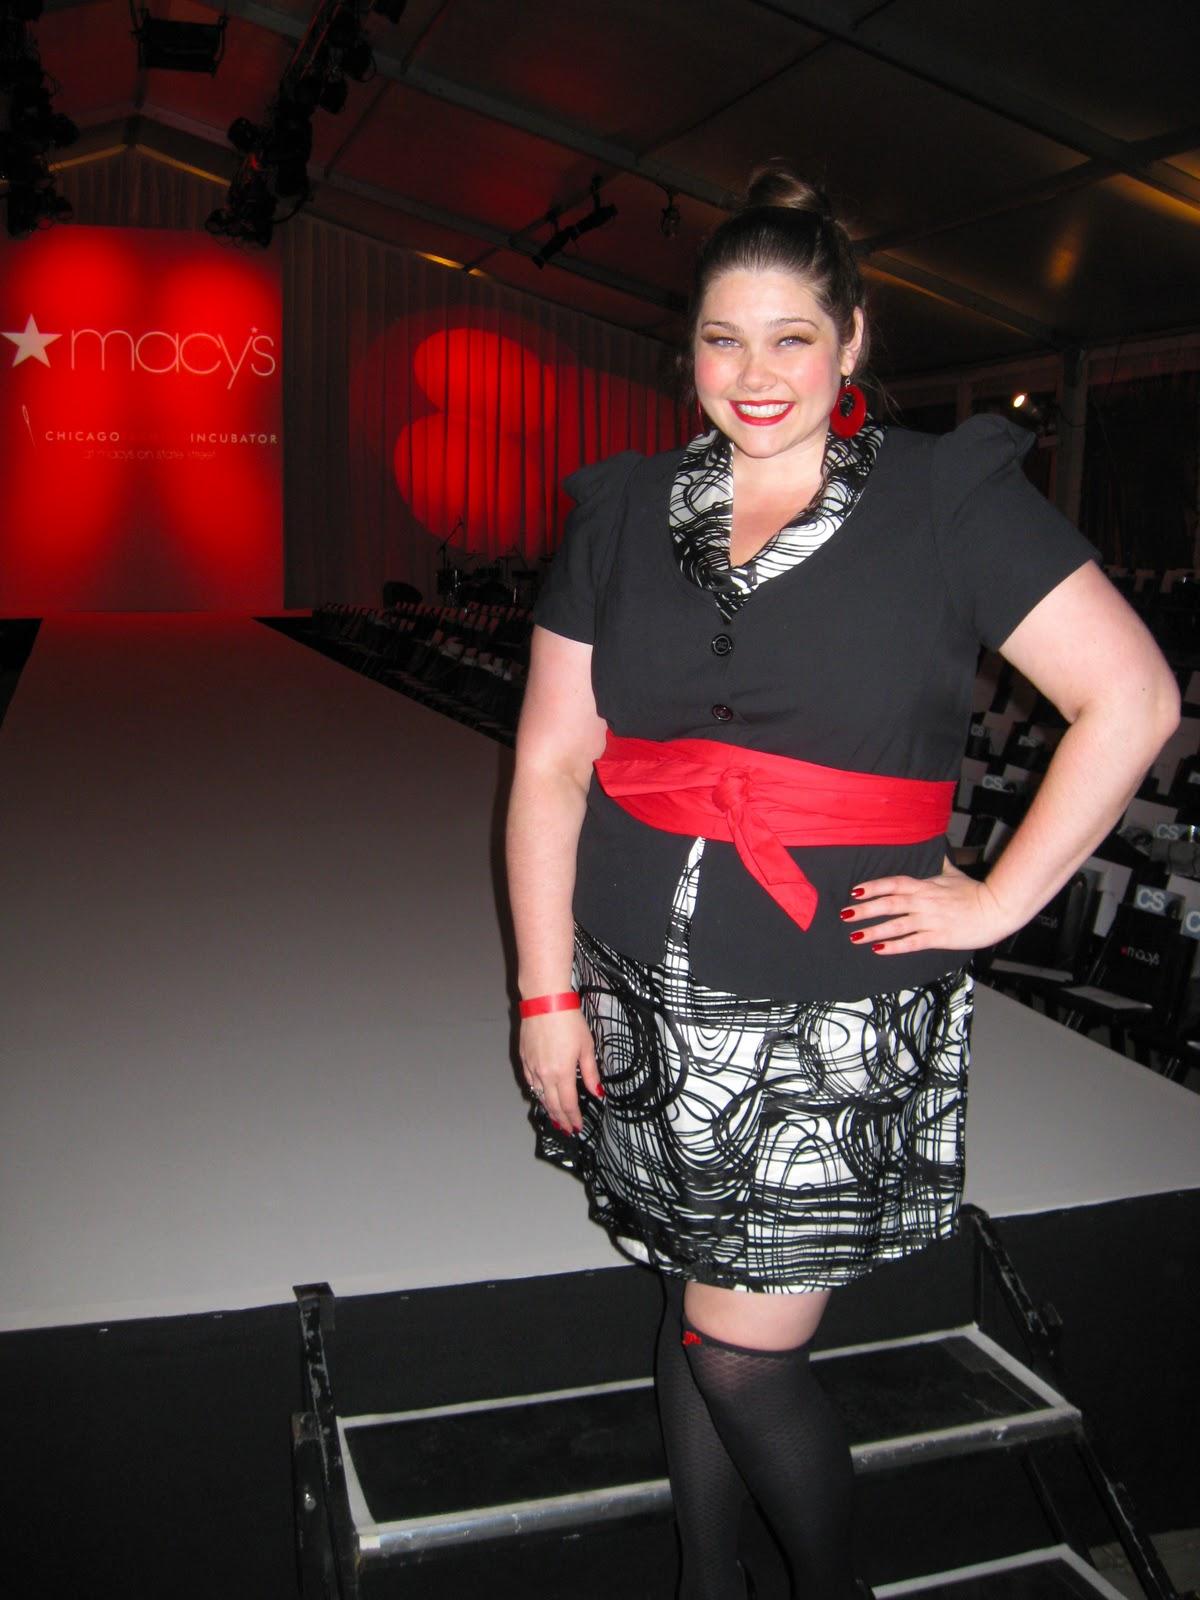 Macy S Fashion Incubator